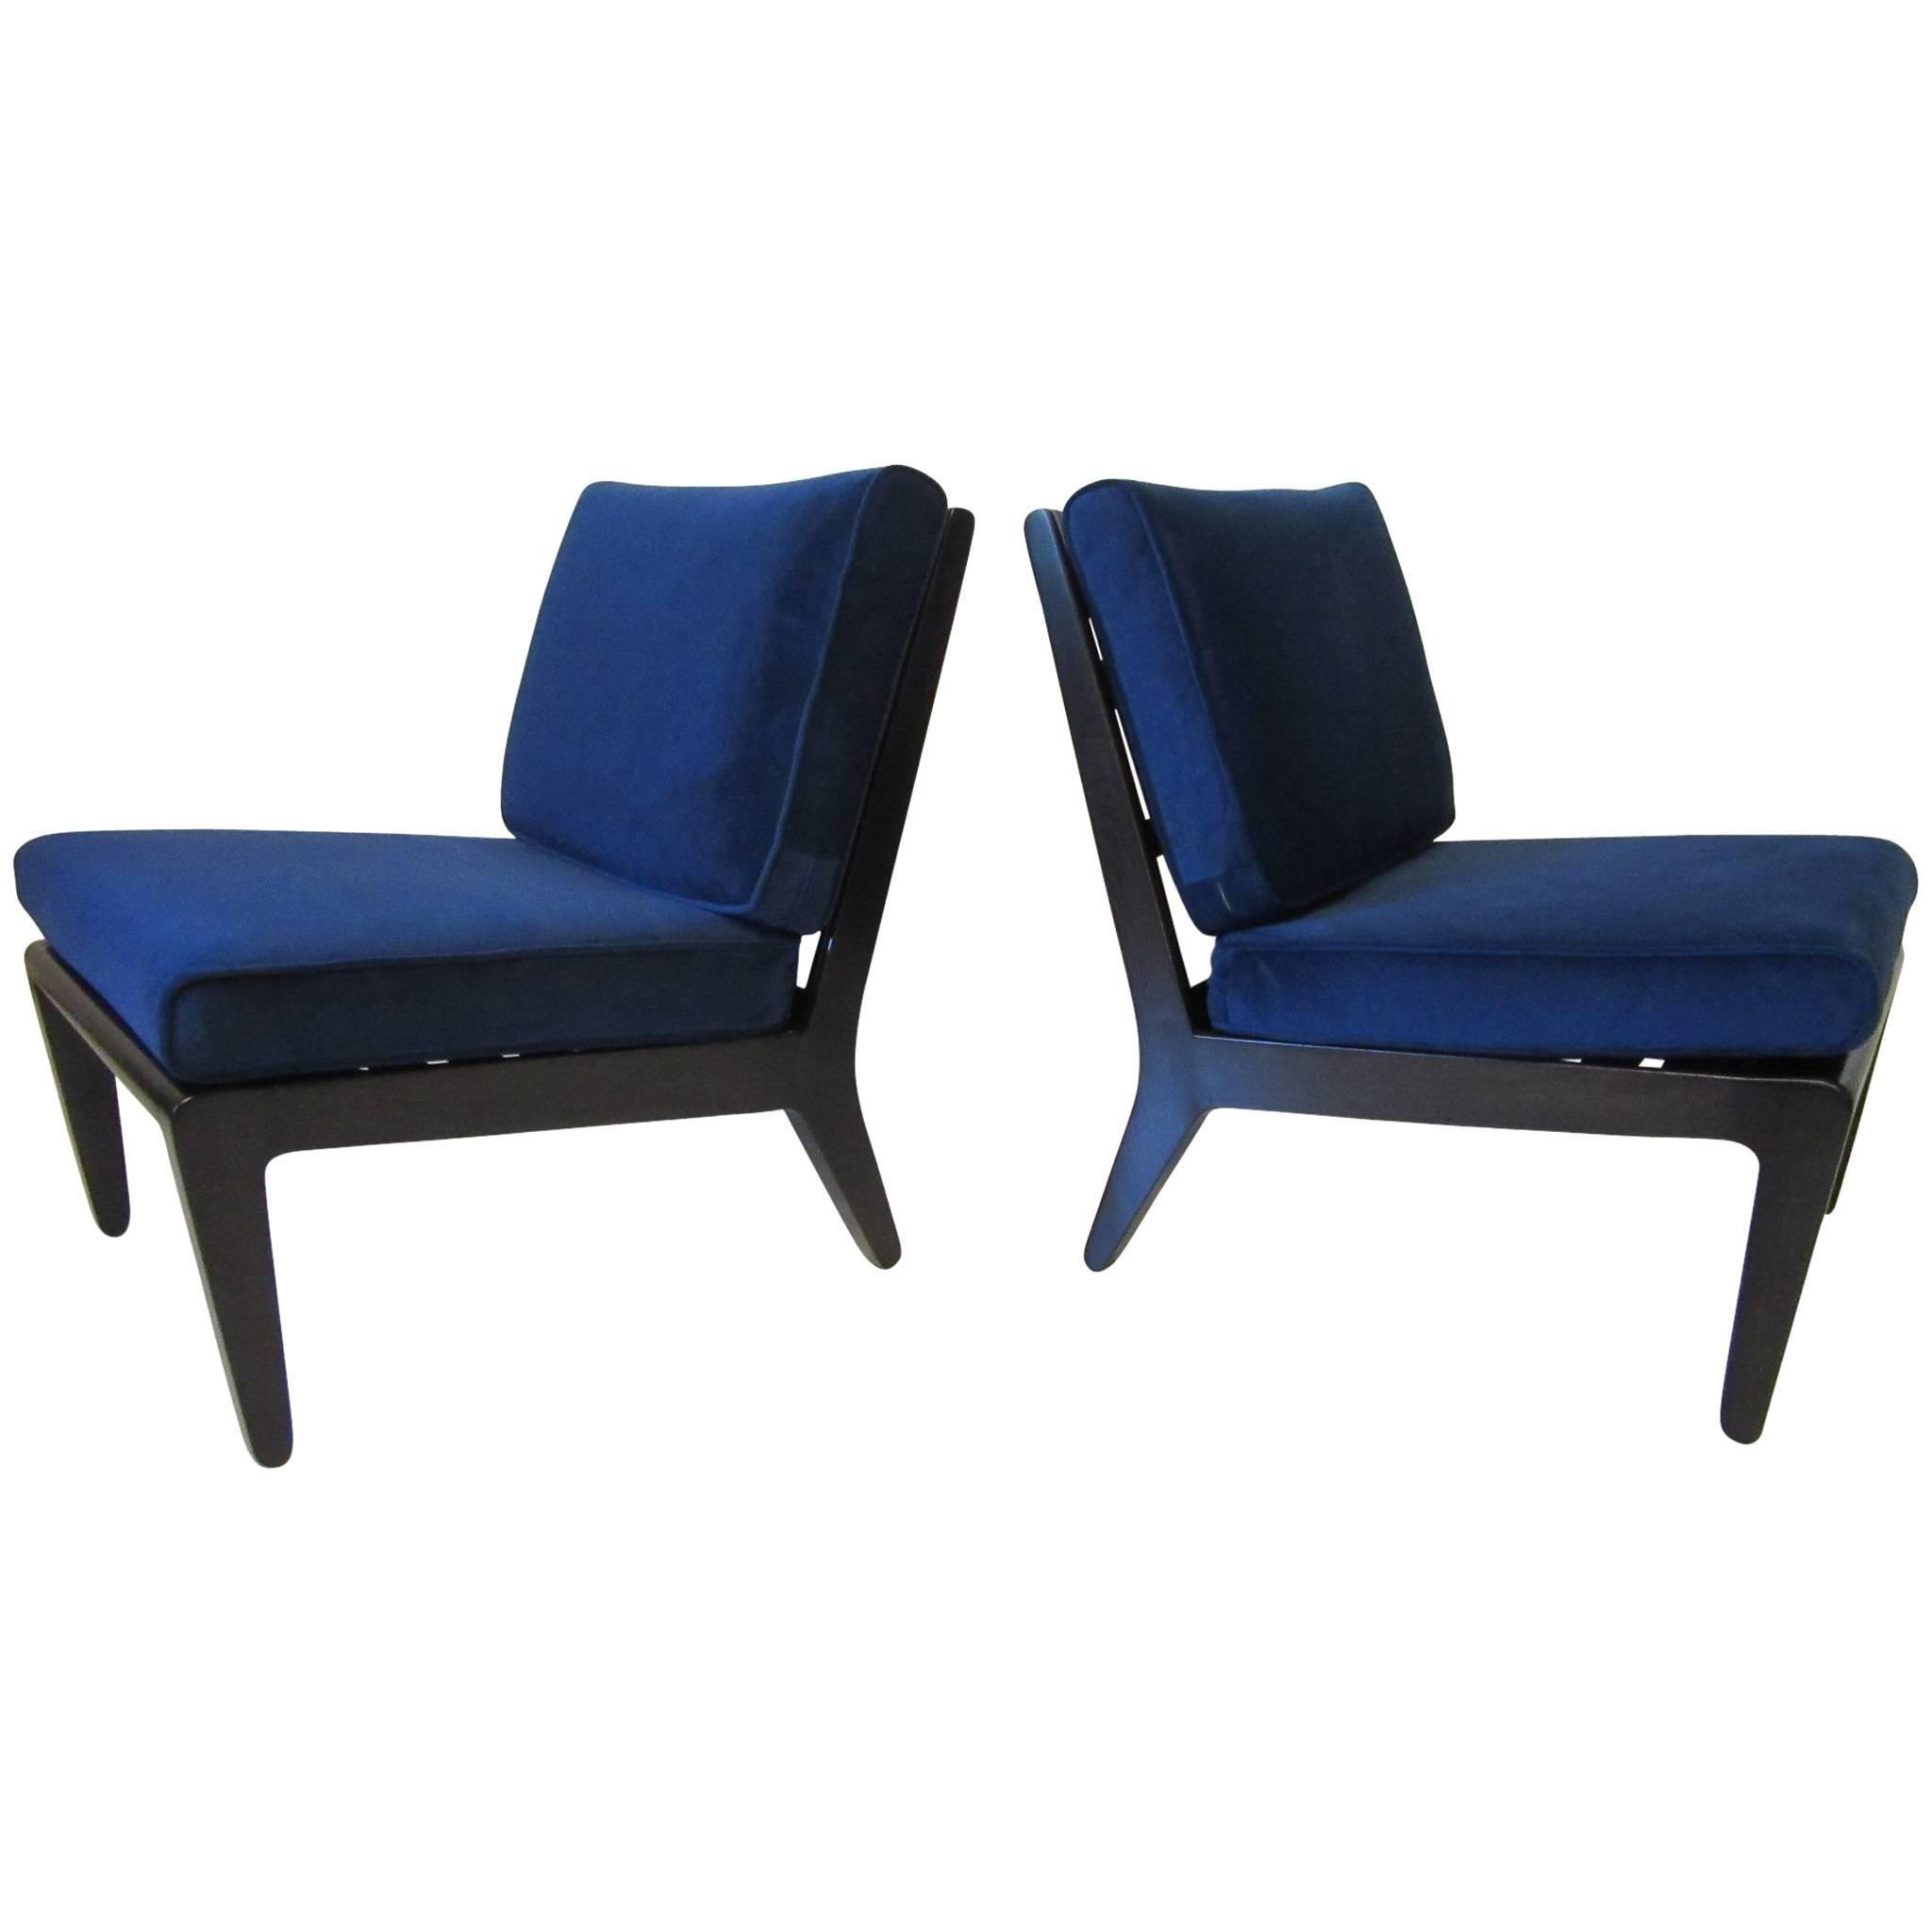 Edward Wormley Ebony Lounge / Slipper Chairs for Drexel